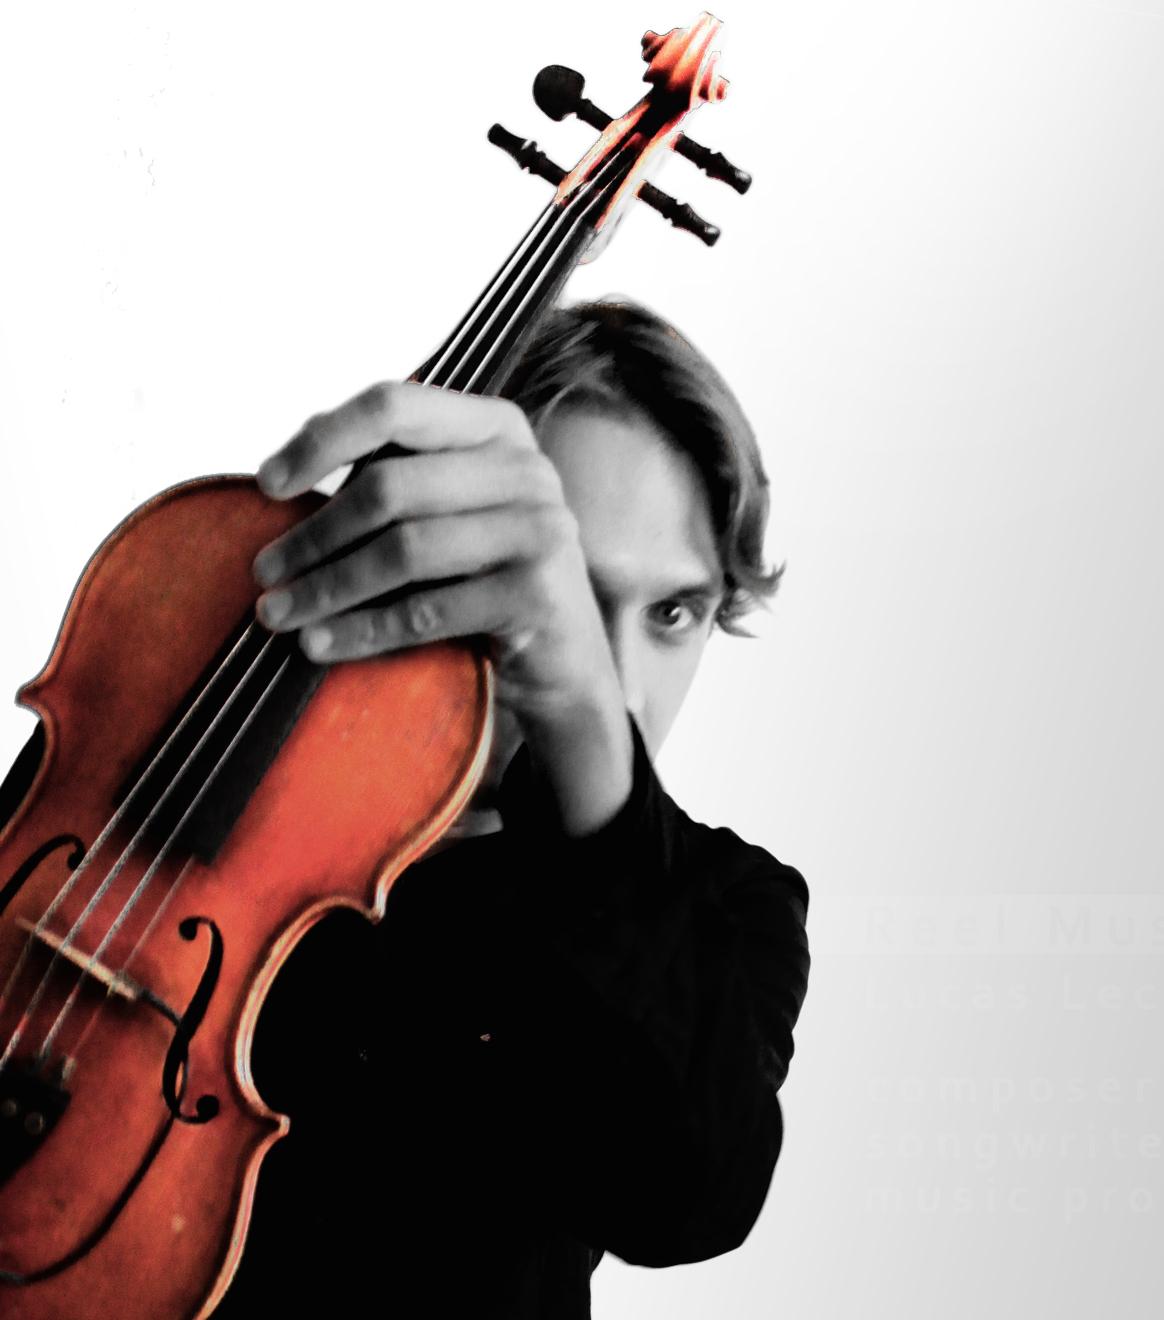 Musician Lucas Lechowski